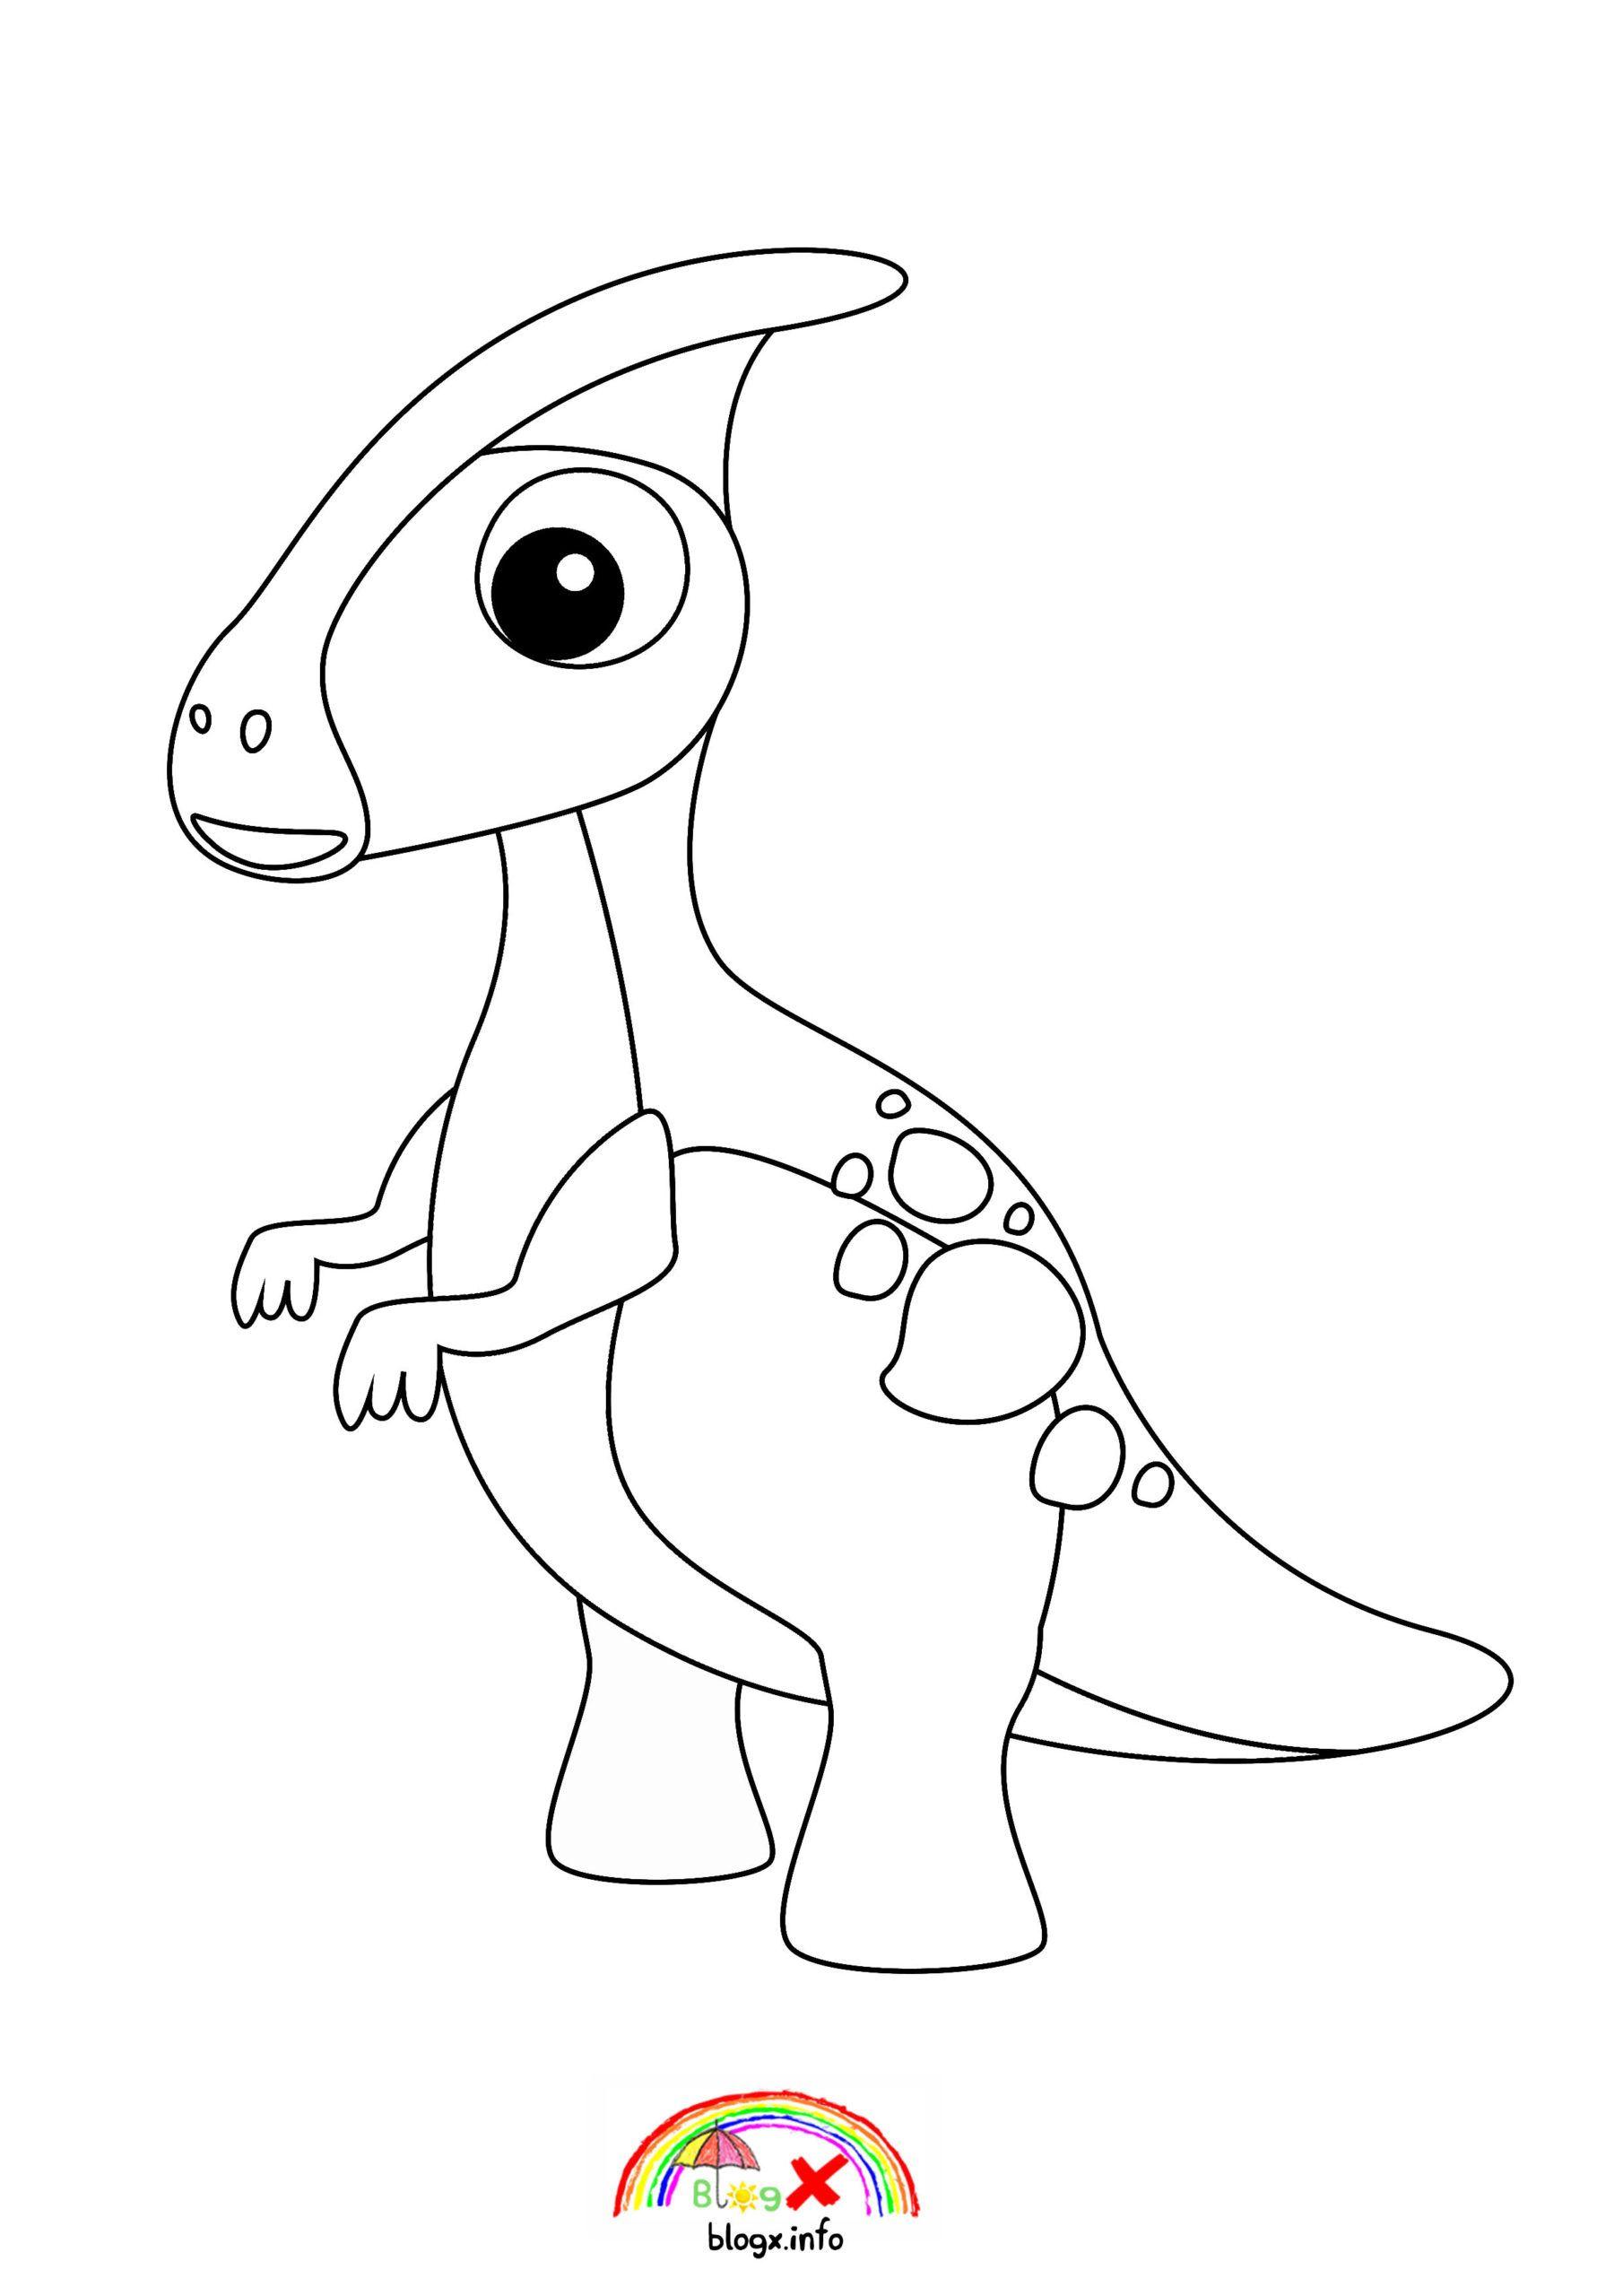 Parasaurolophus Coloring Page Coloring Pages Dinosaur Color